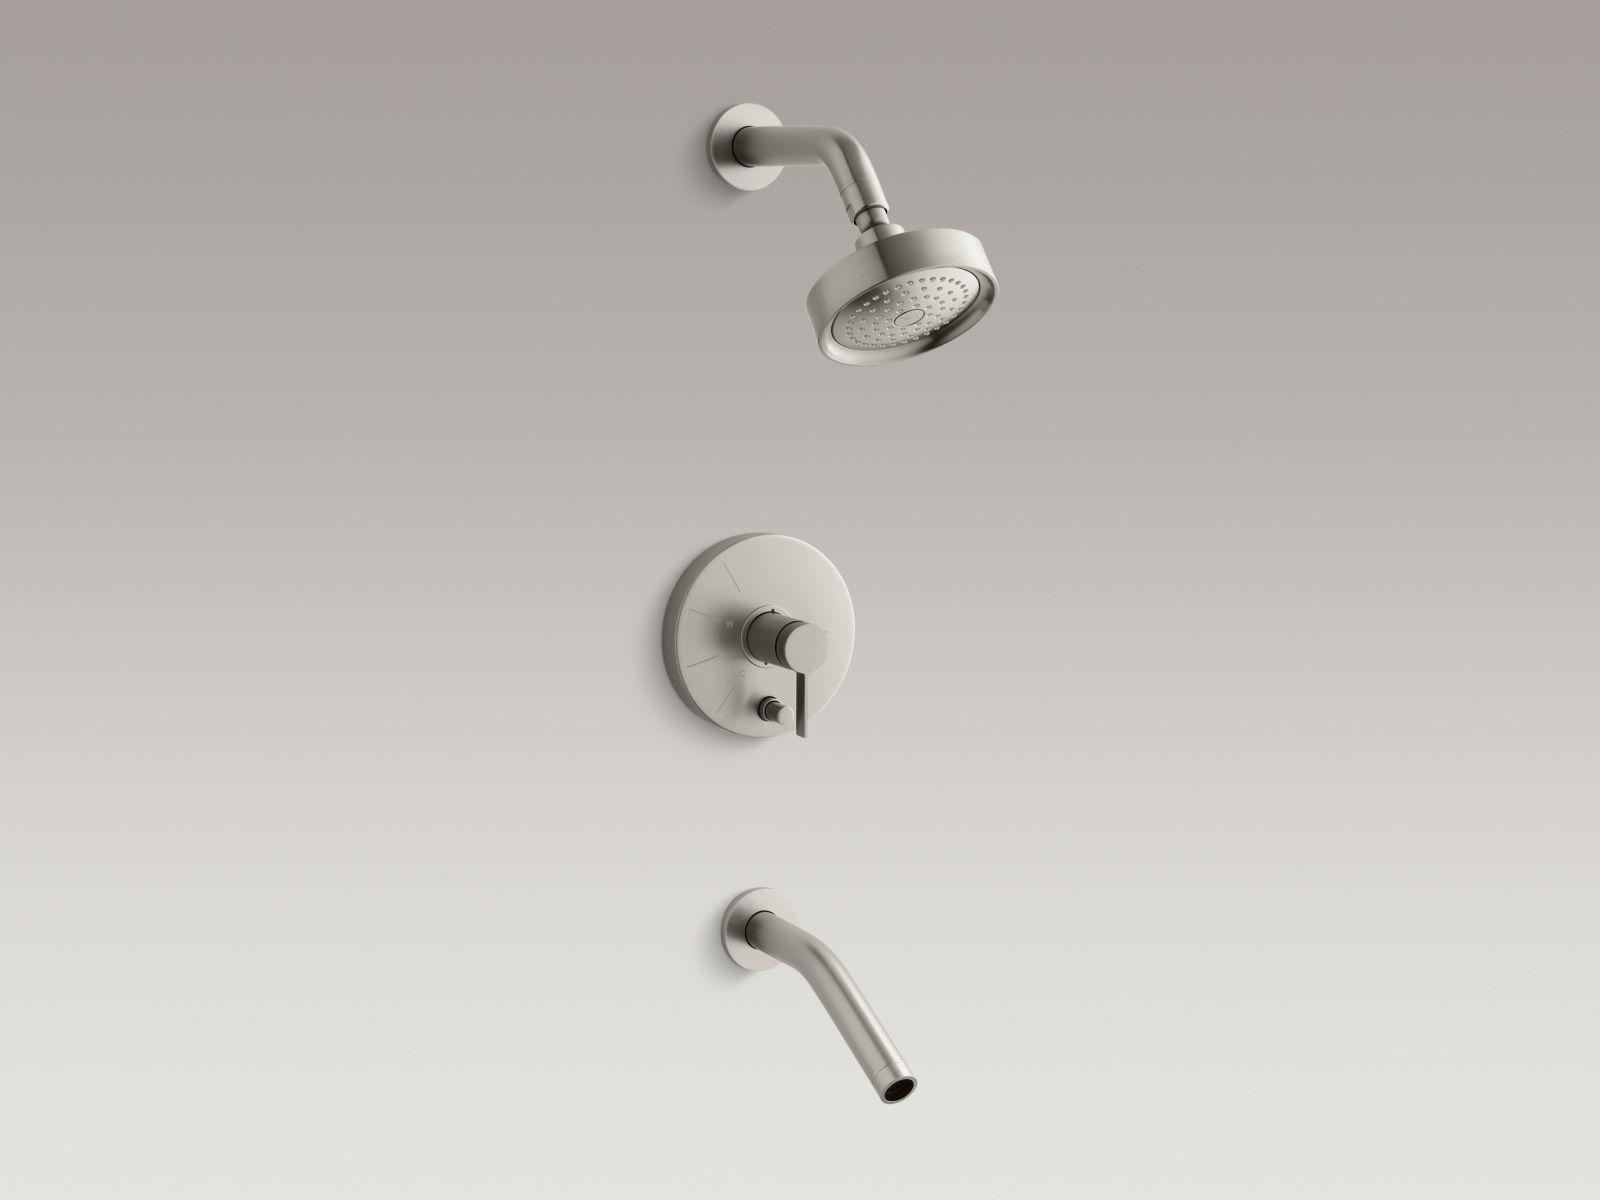 Kohler Stillness® K-T948-4-BN Rite-Temp® pressure-balancing bath and shower faucet trim with lever handle, valve not included Vibrant Brushed Nickel